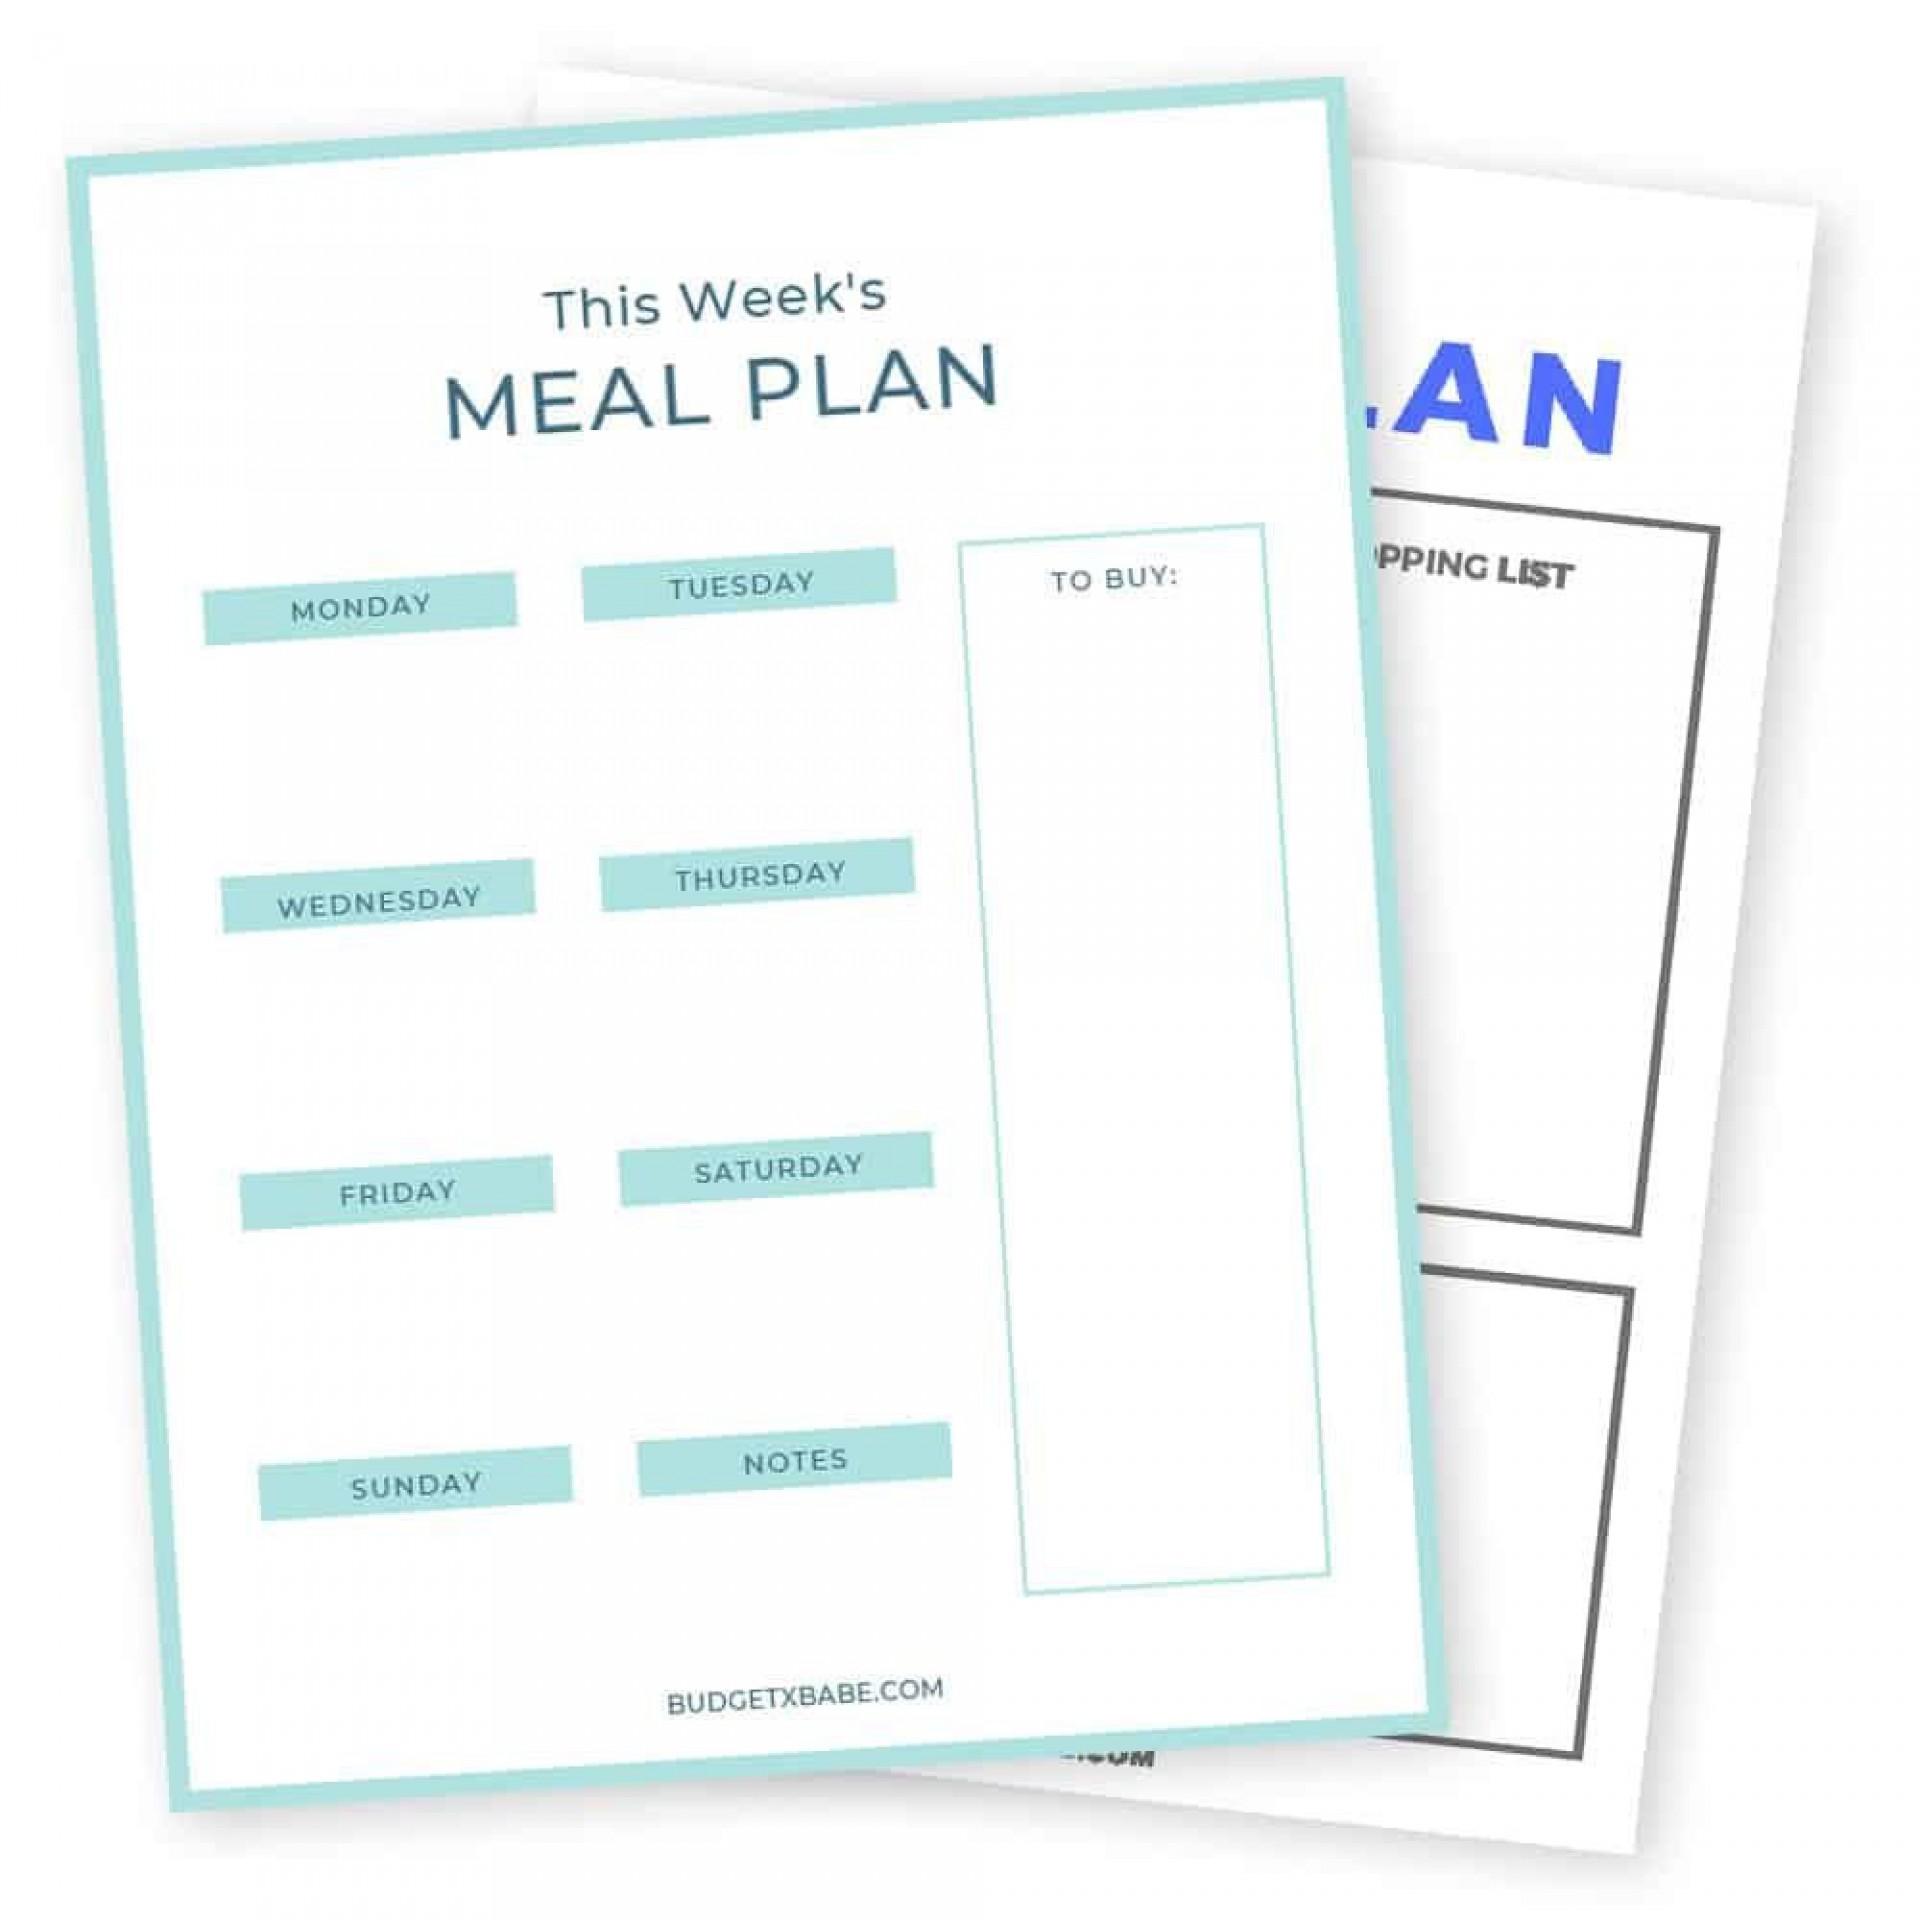 009 Frightening Meal Plan Printable Pdf Example  Worksheet Downloadable Template Sheet1920